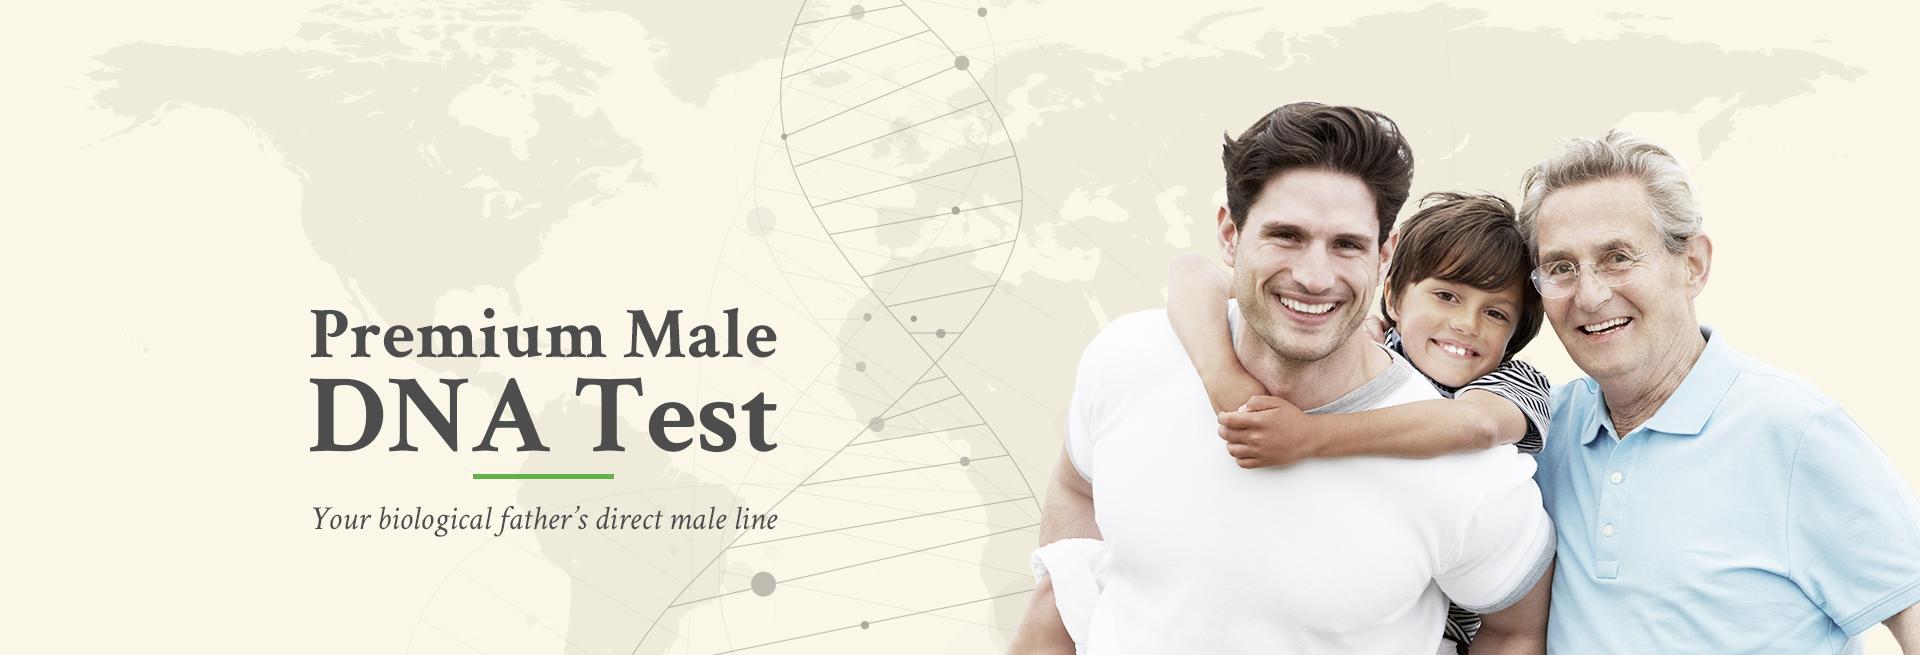 premium male dna test